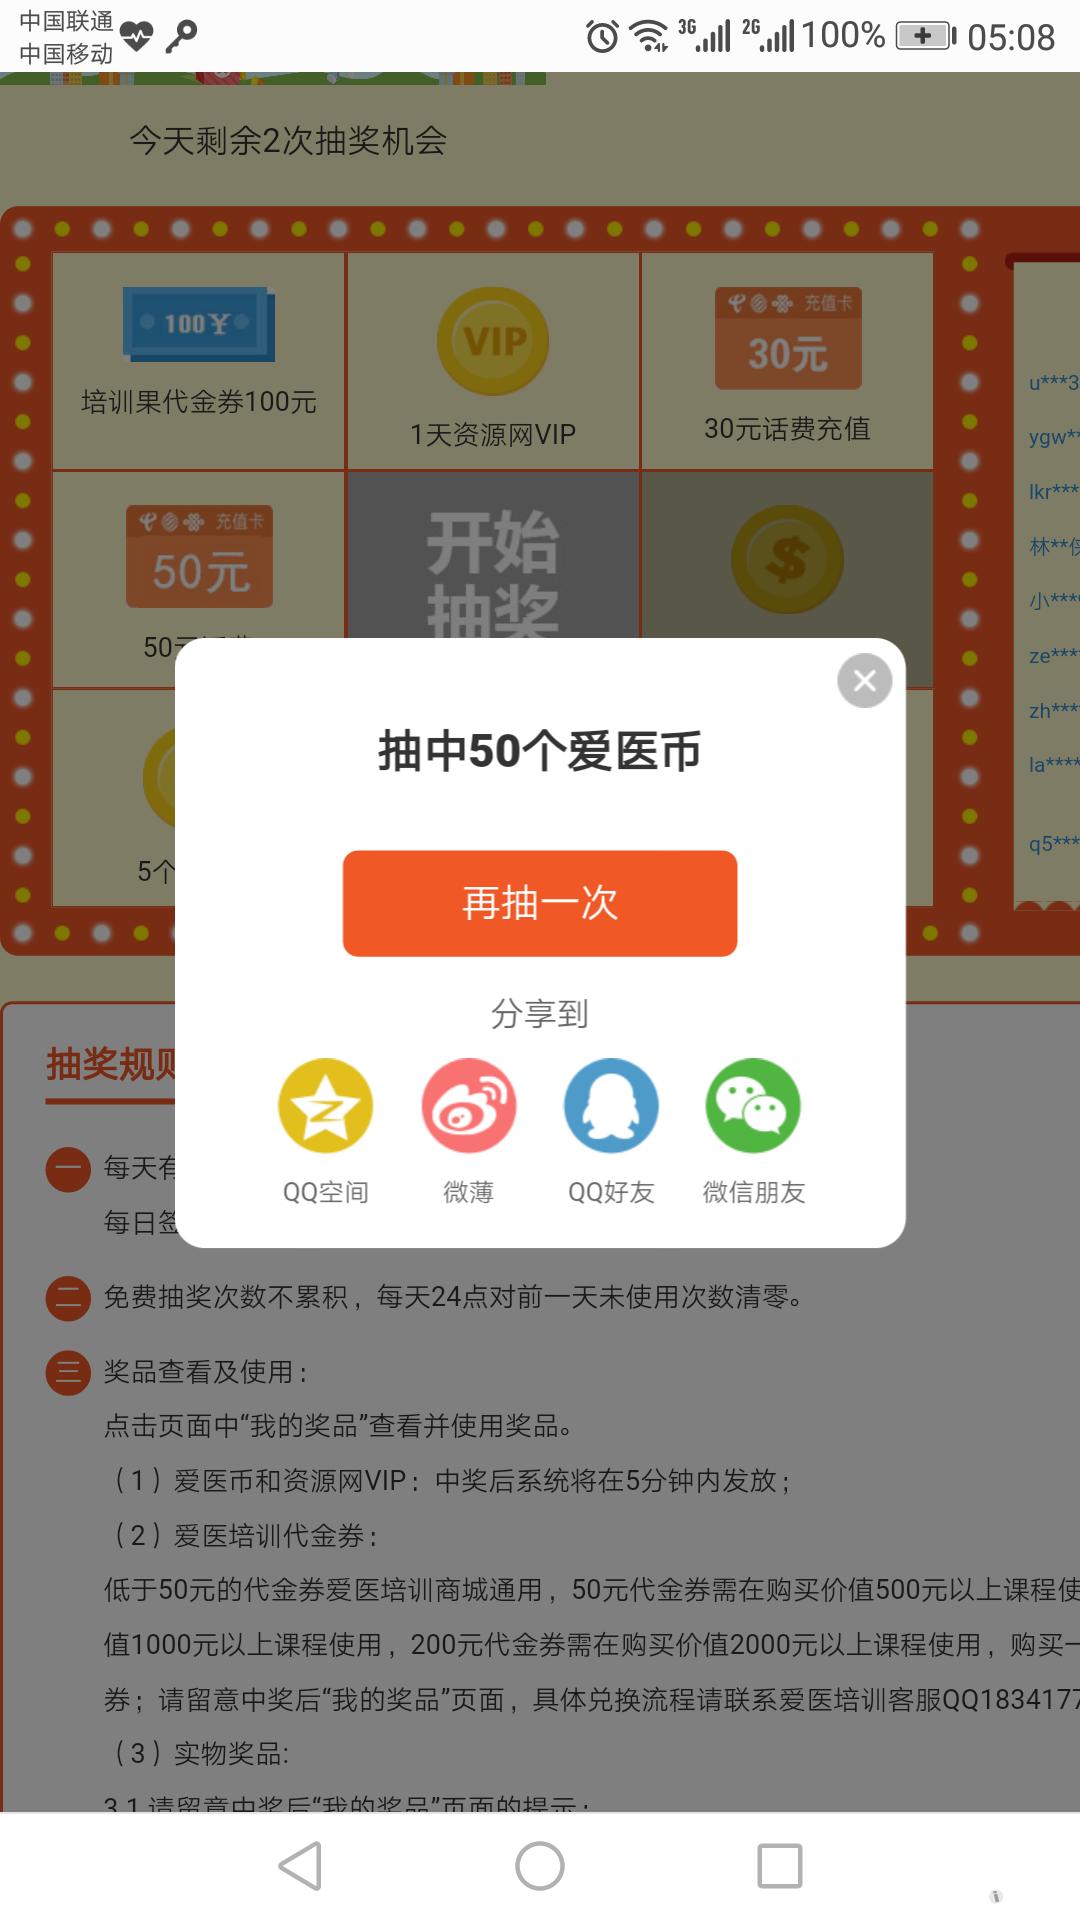 Screenshot_20180509-050823.png